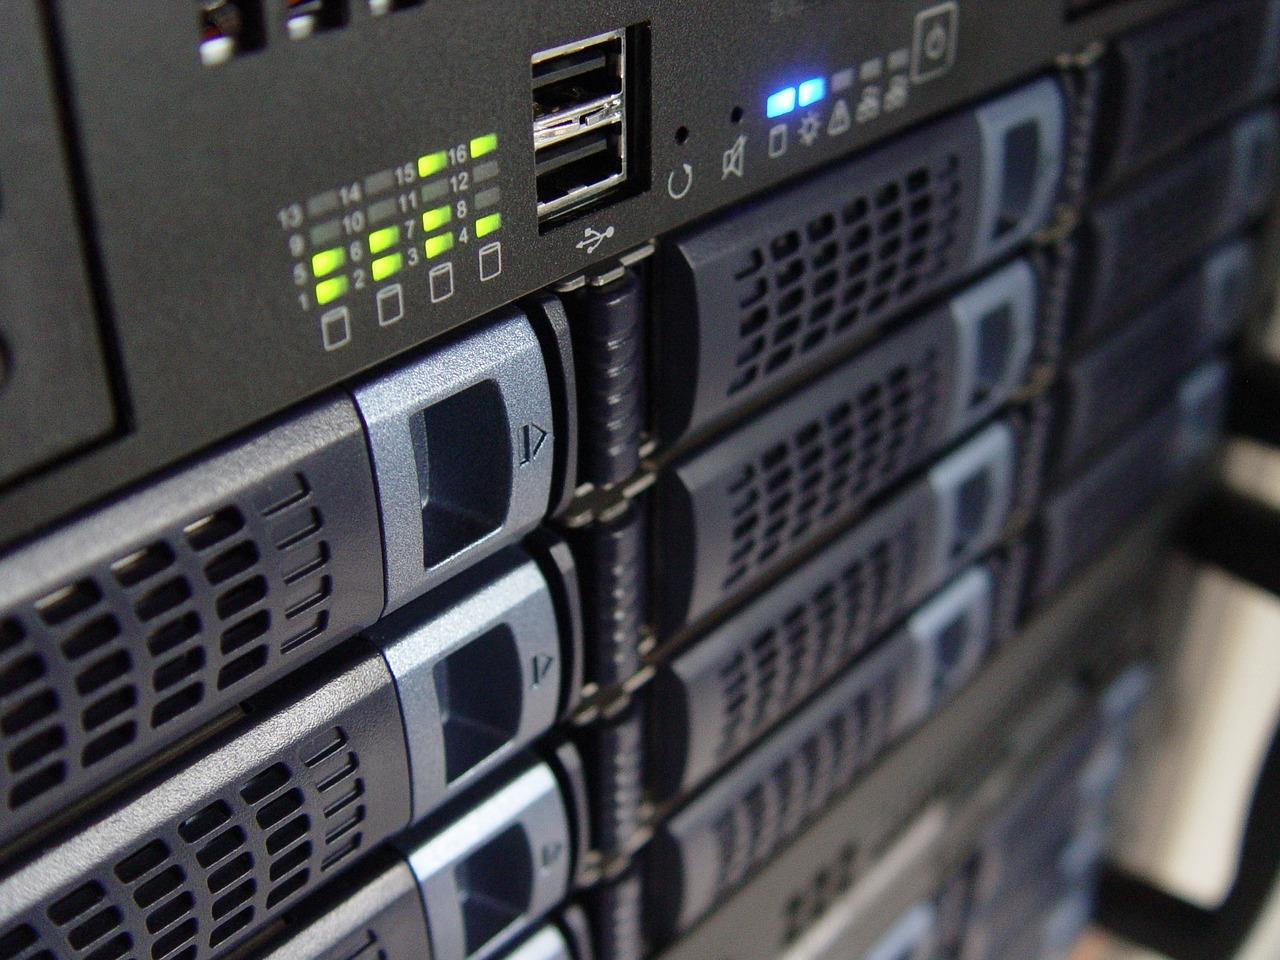 cz trattamento acque main header versione desktop - foto web server control